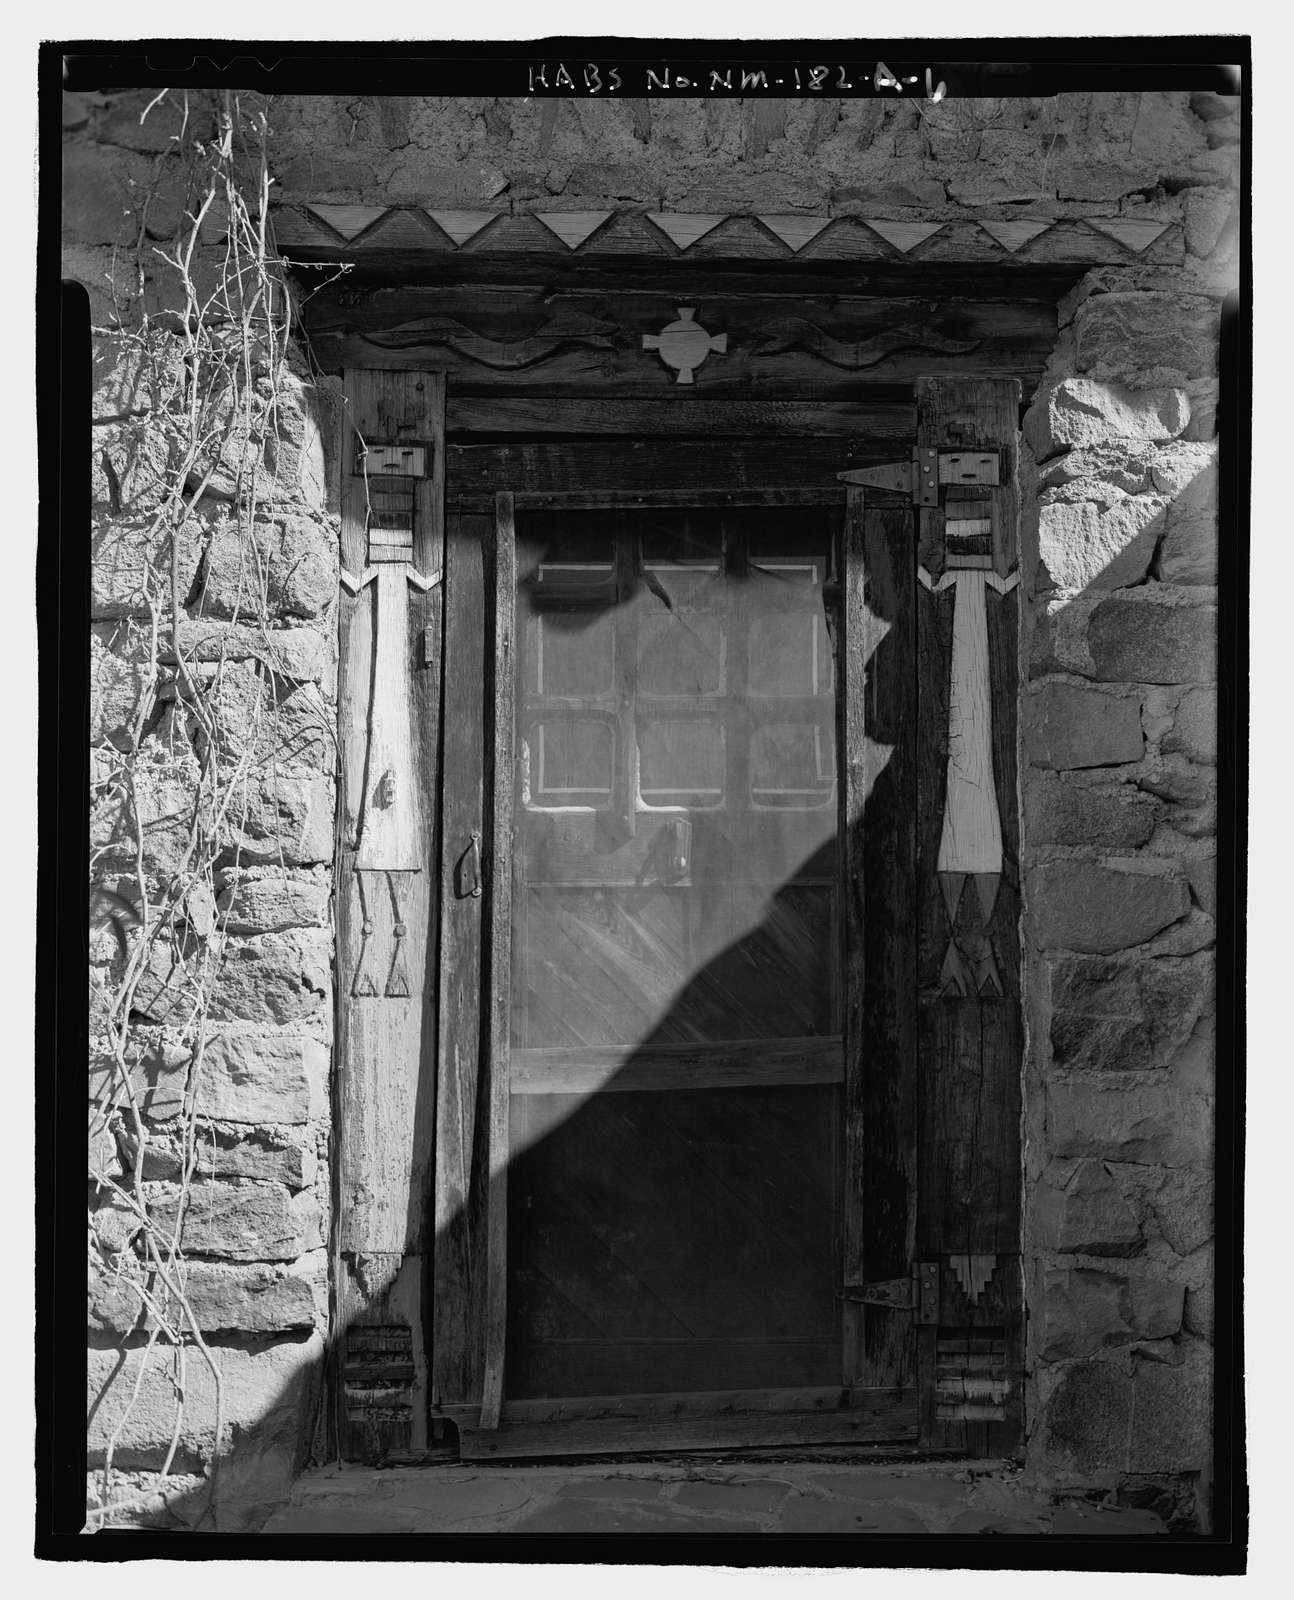 Indian Village, Ernest Thompson Seton House, Six miles southeast of Santa Fe, off U.S. Route 84-85, Seton Village, Santa Fe County, NM